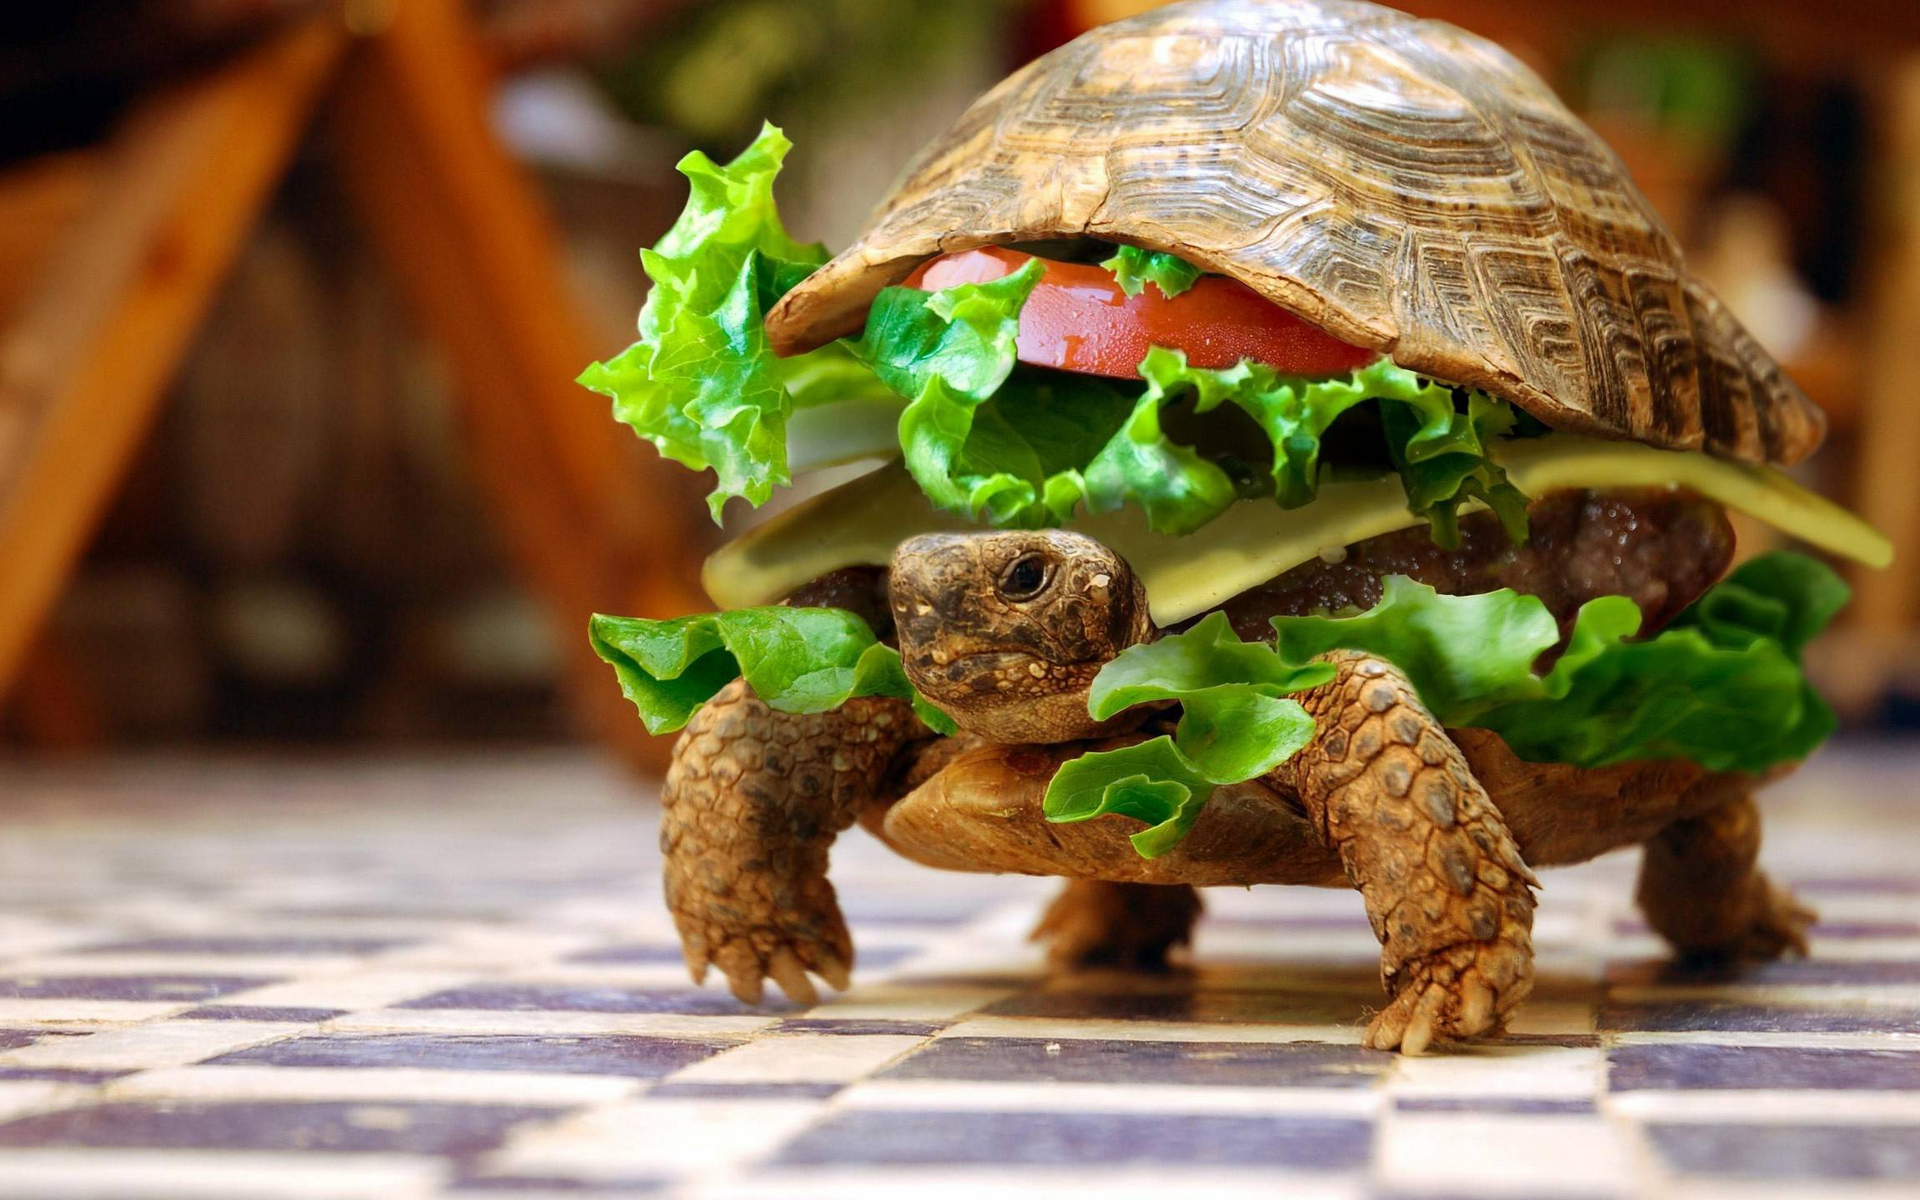 обои черепаха, чизбургер, панцирь, зелень картинки фото